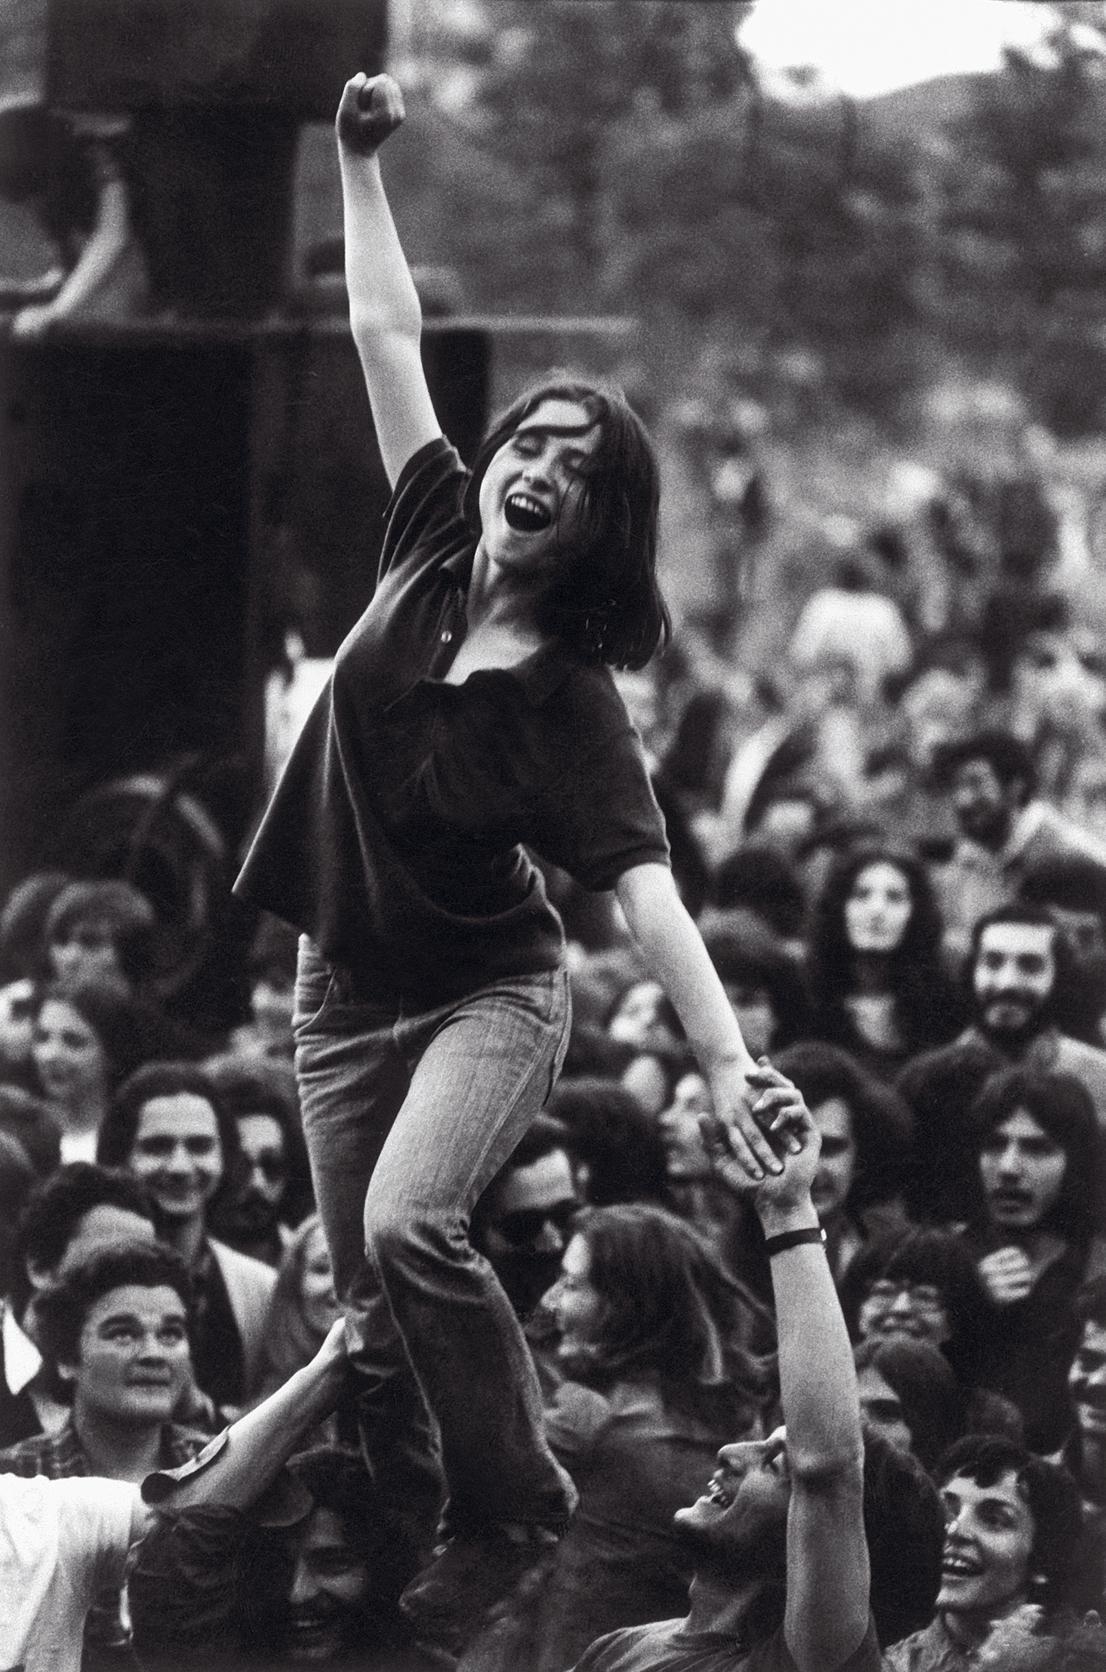 Lotta continua, 1977. Foto di Toni Thorimbert.